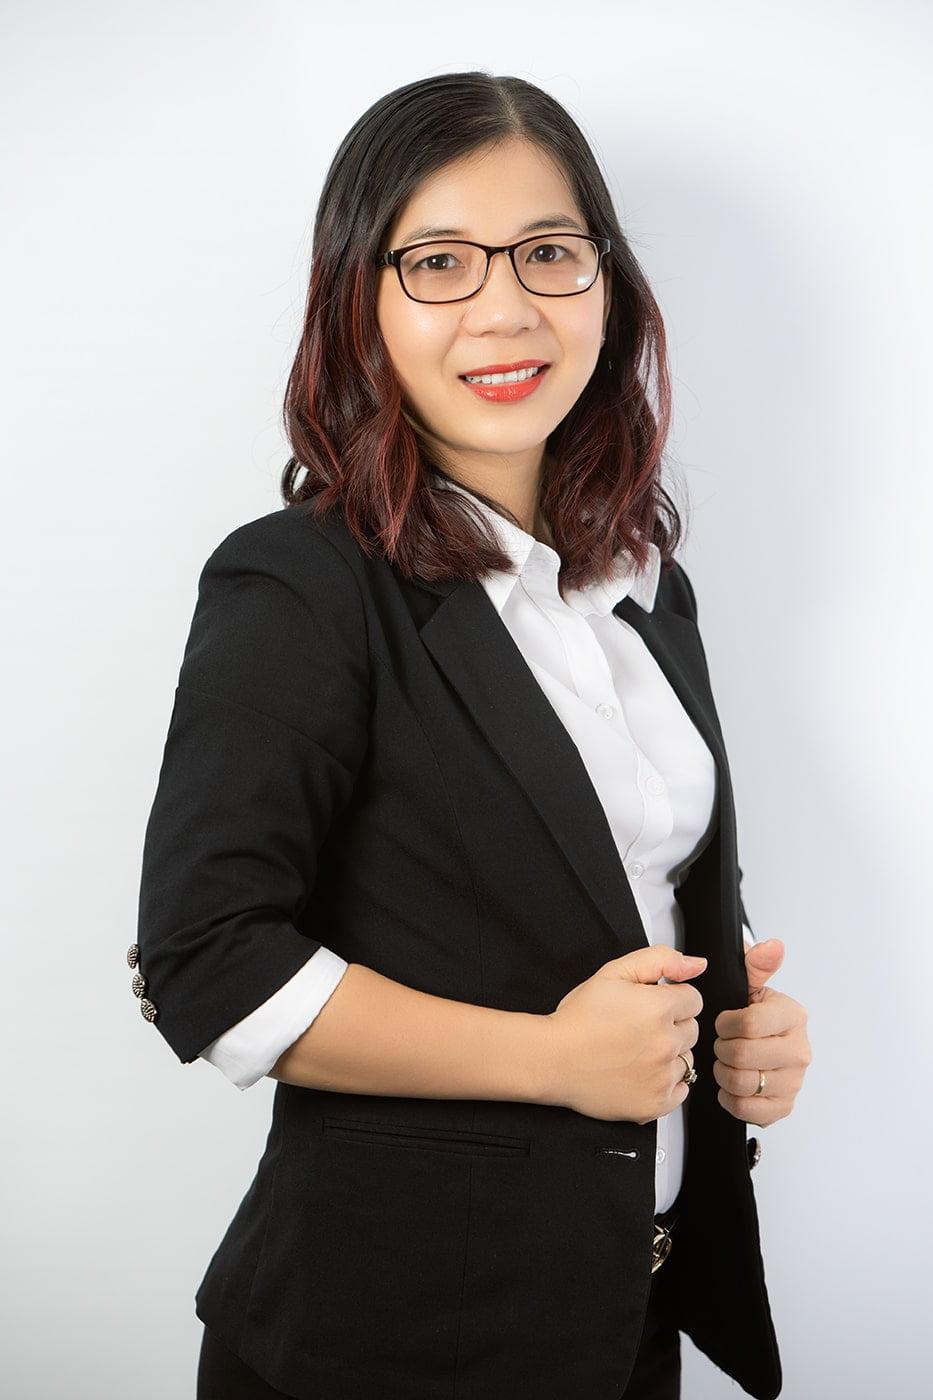 Profile cong ty 26 - Album chụp ảnh profile công ty Luật Dzungsrt Law - HThao Studio